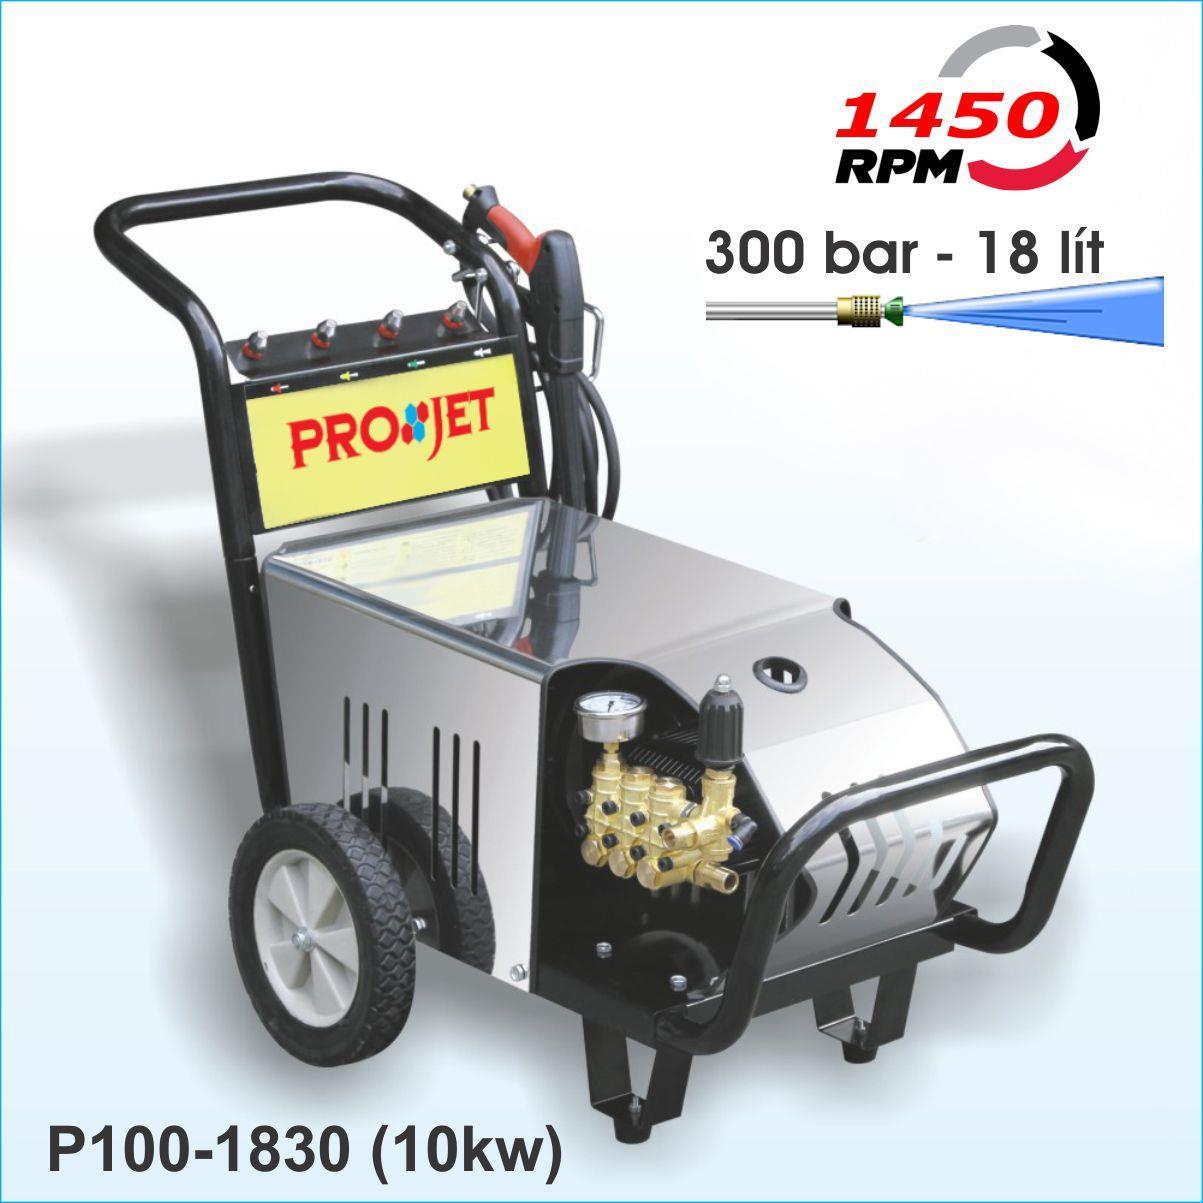 Máy rửa ô tô áp lực cao 10kw P100-1830